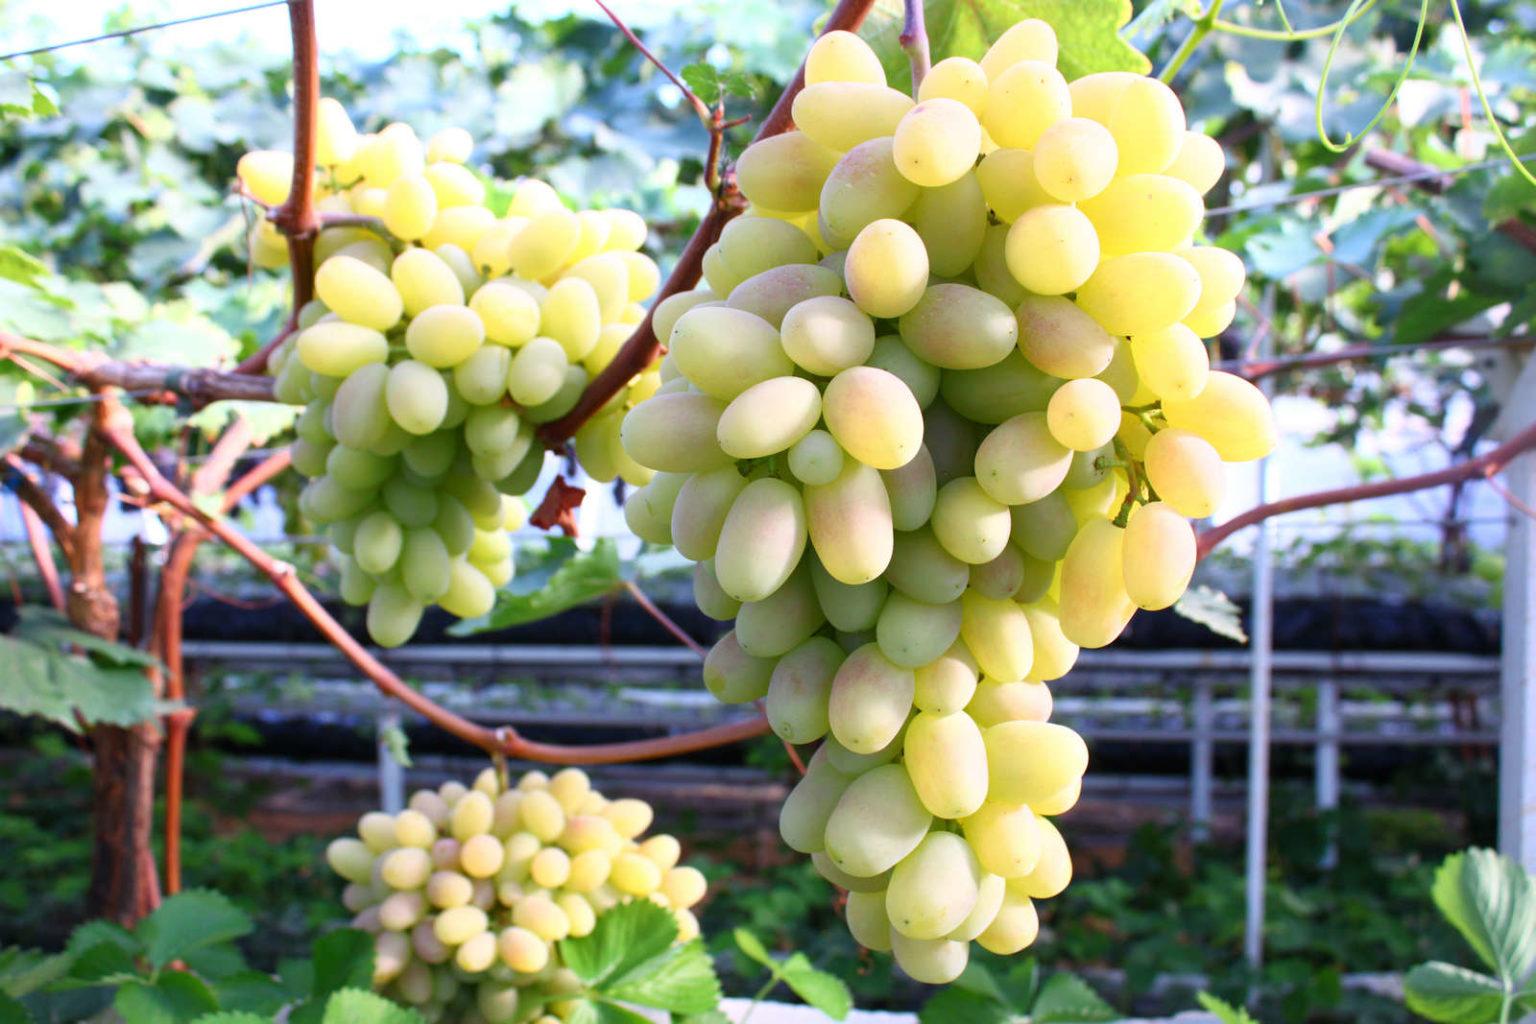 Сорт винограда благовест фото